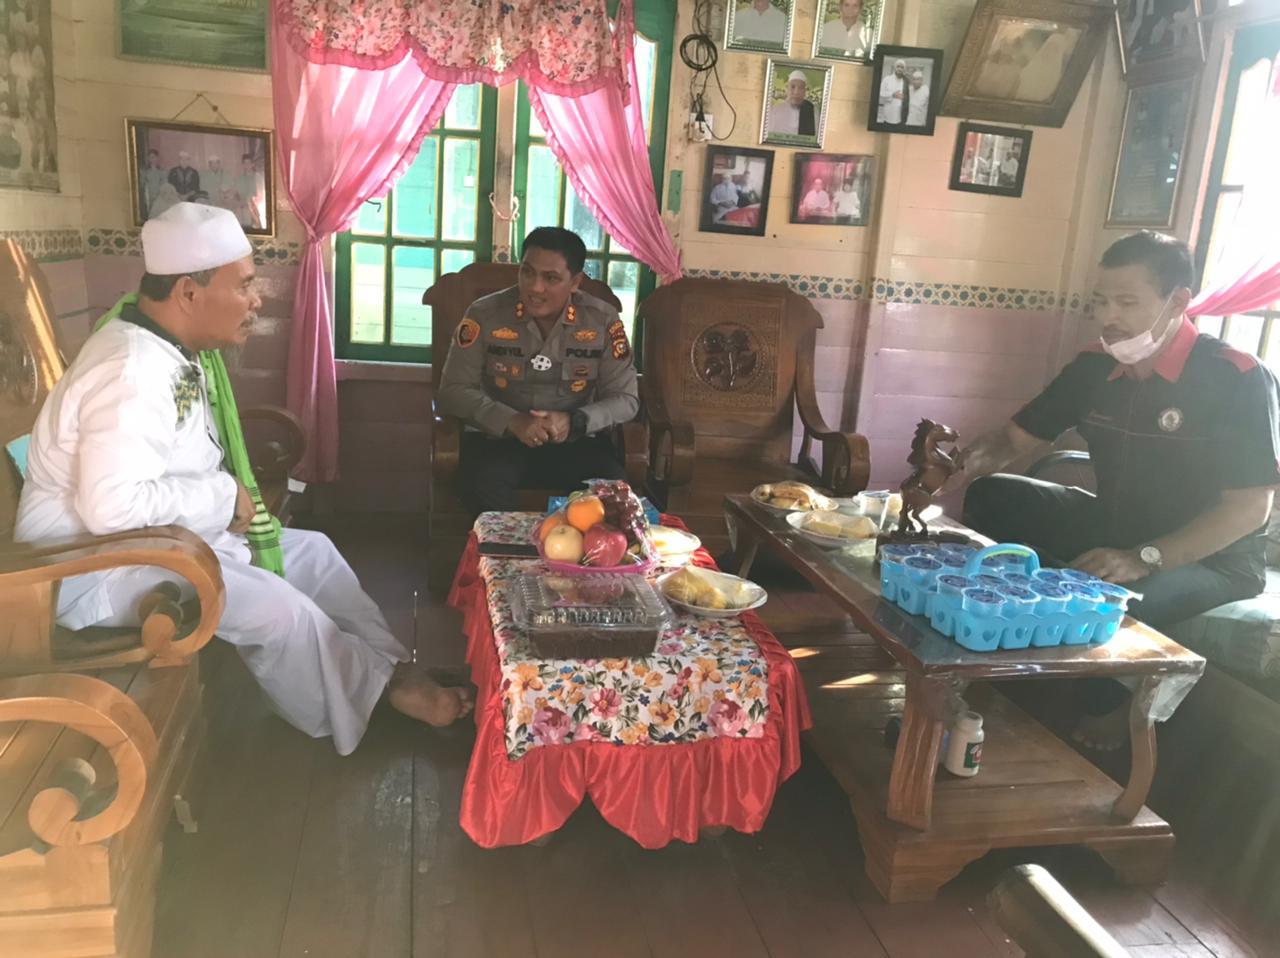 Foto saat Kapolres Kepulauan Meranti, AKBP Andi Yul L.T.G SH., SIK., MH bersilaturahmi ke kediaman Pengasuh Pondok Pesantren (Ponpes) Raudhatul Qur'an, Kyai Mustafa, di Desa Mantiasa.